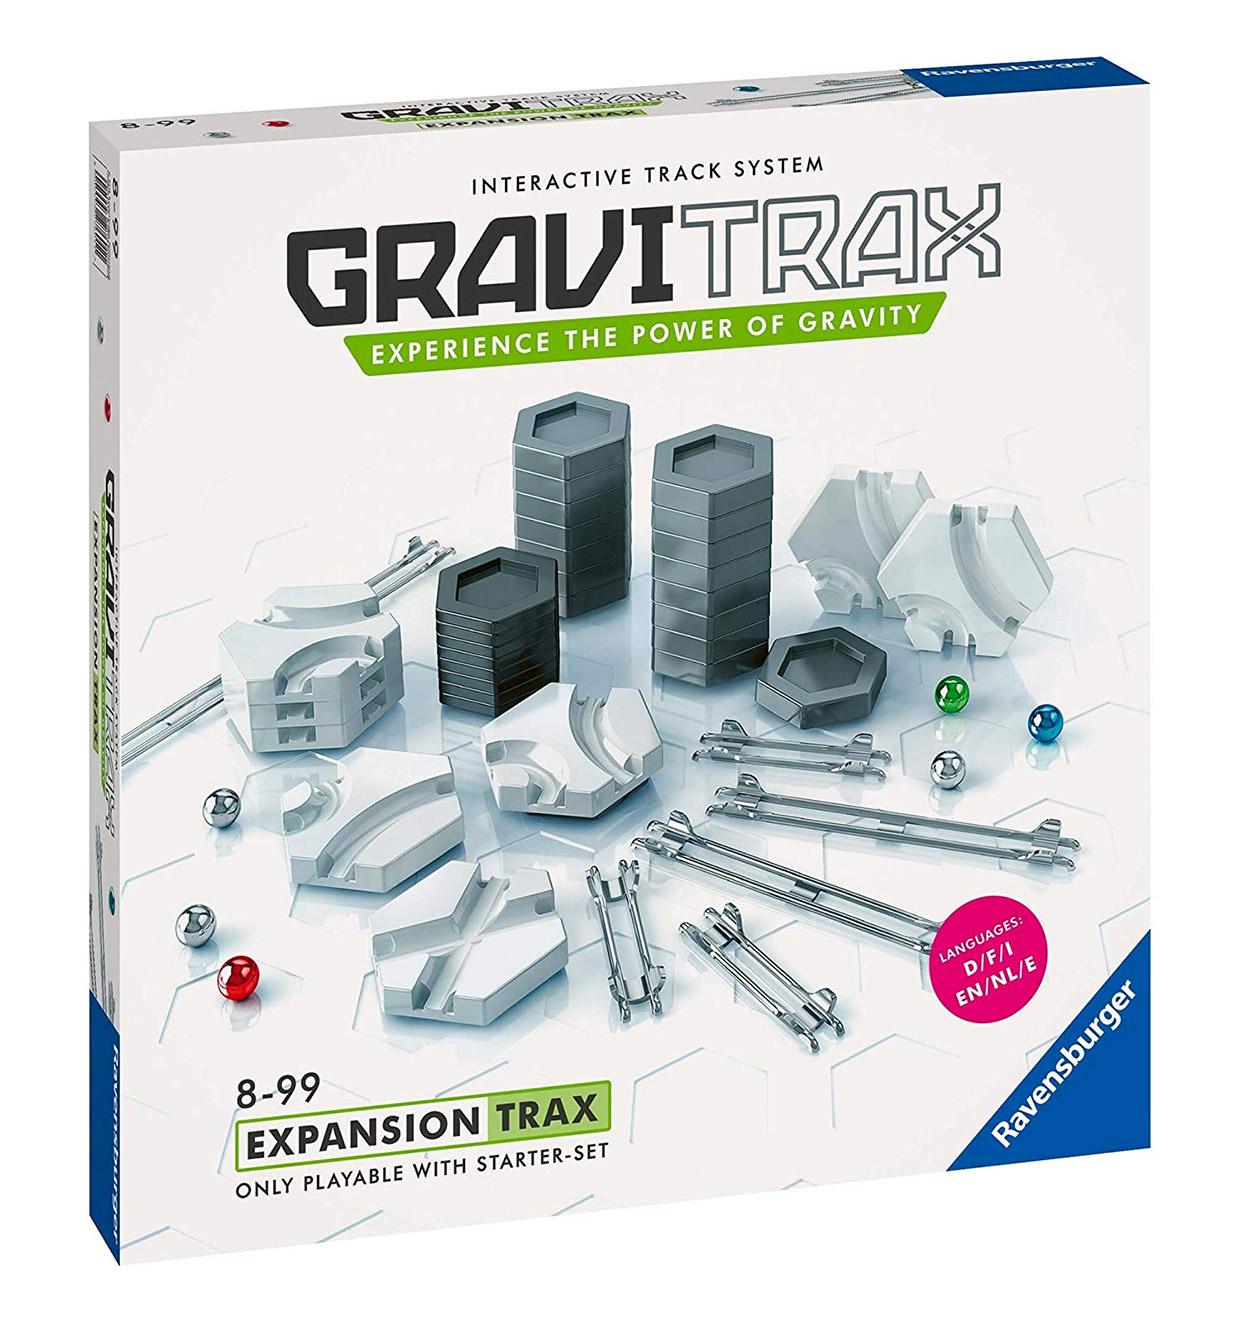 GraviTrax Marble Run Kits